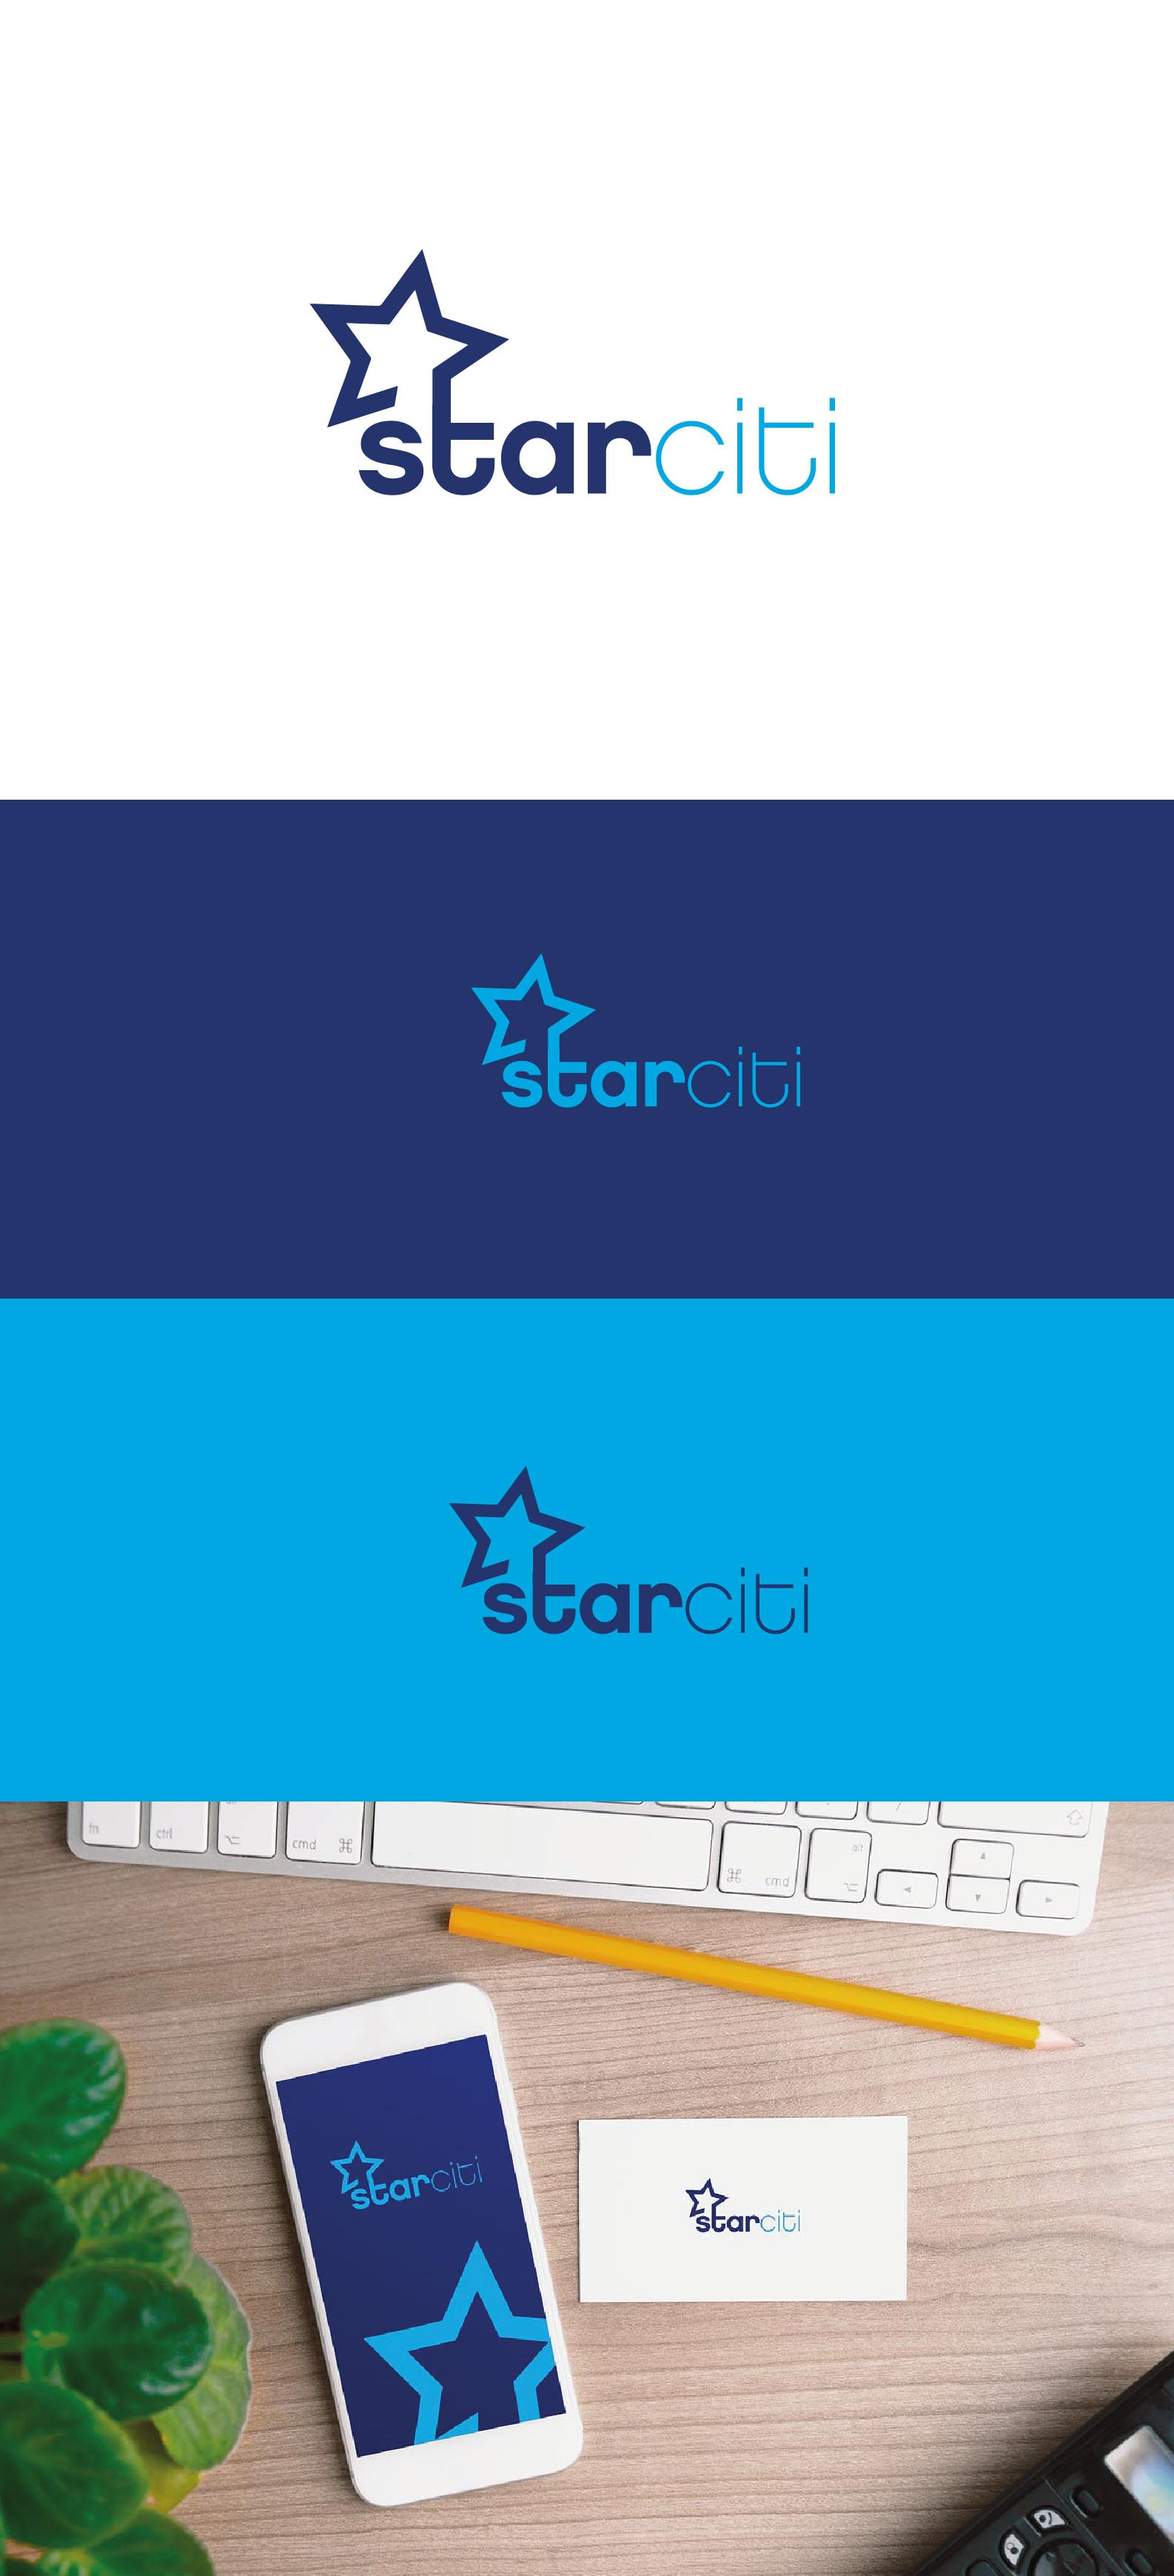 Starciti-logo